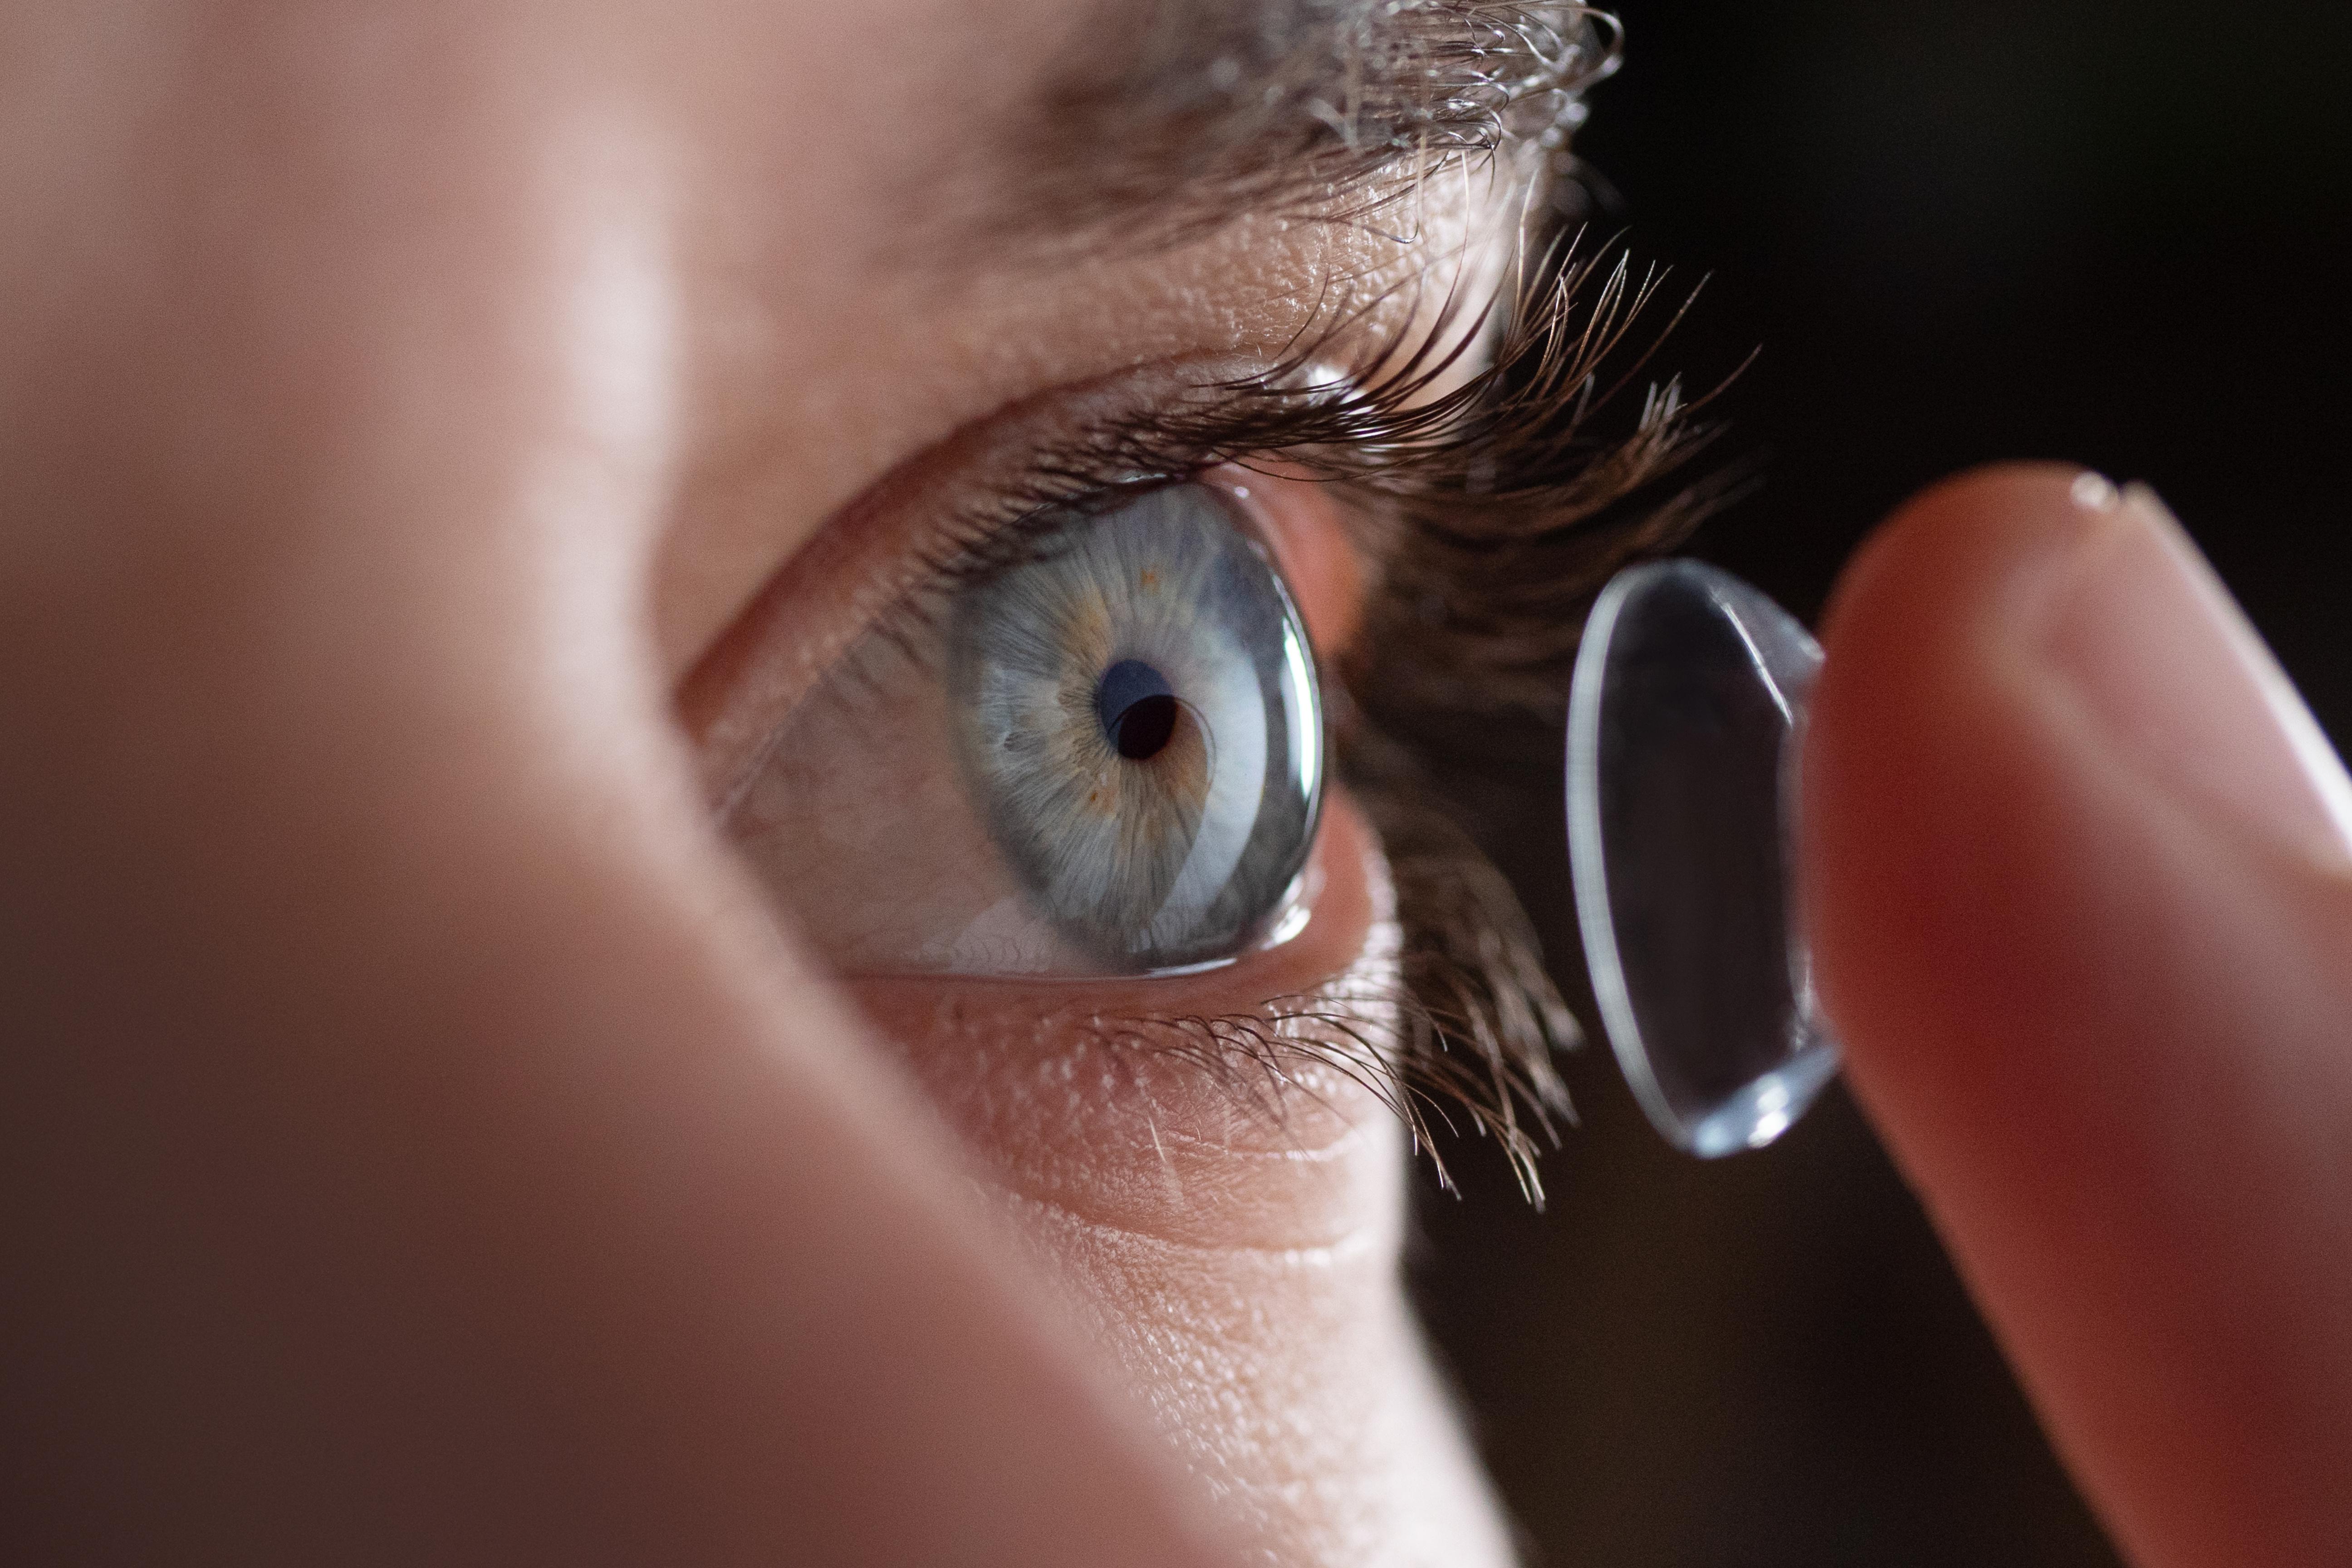 finger holding contact lens near eye